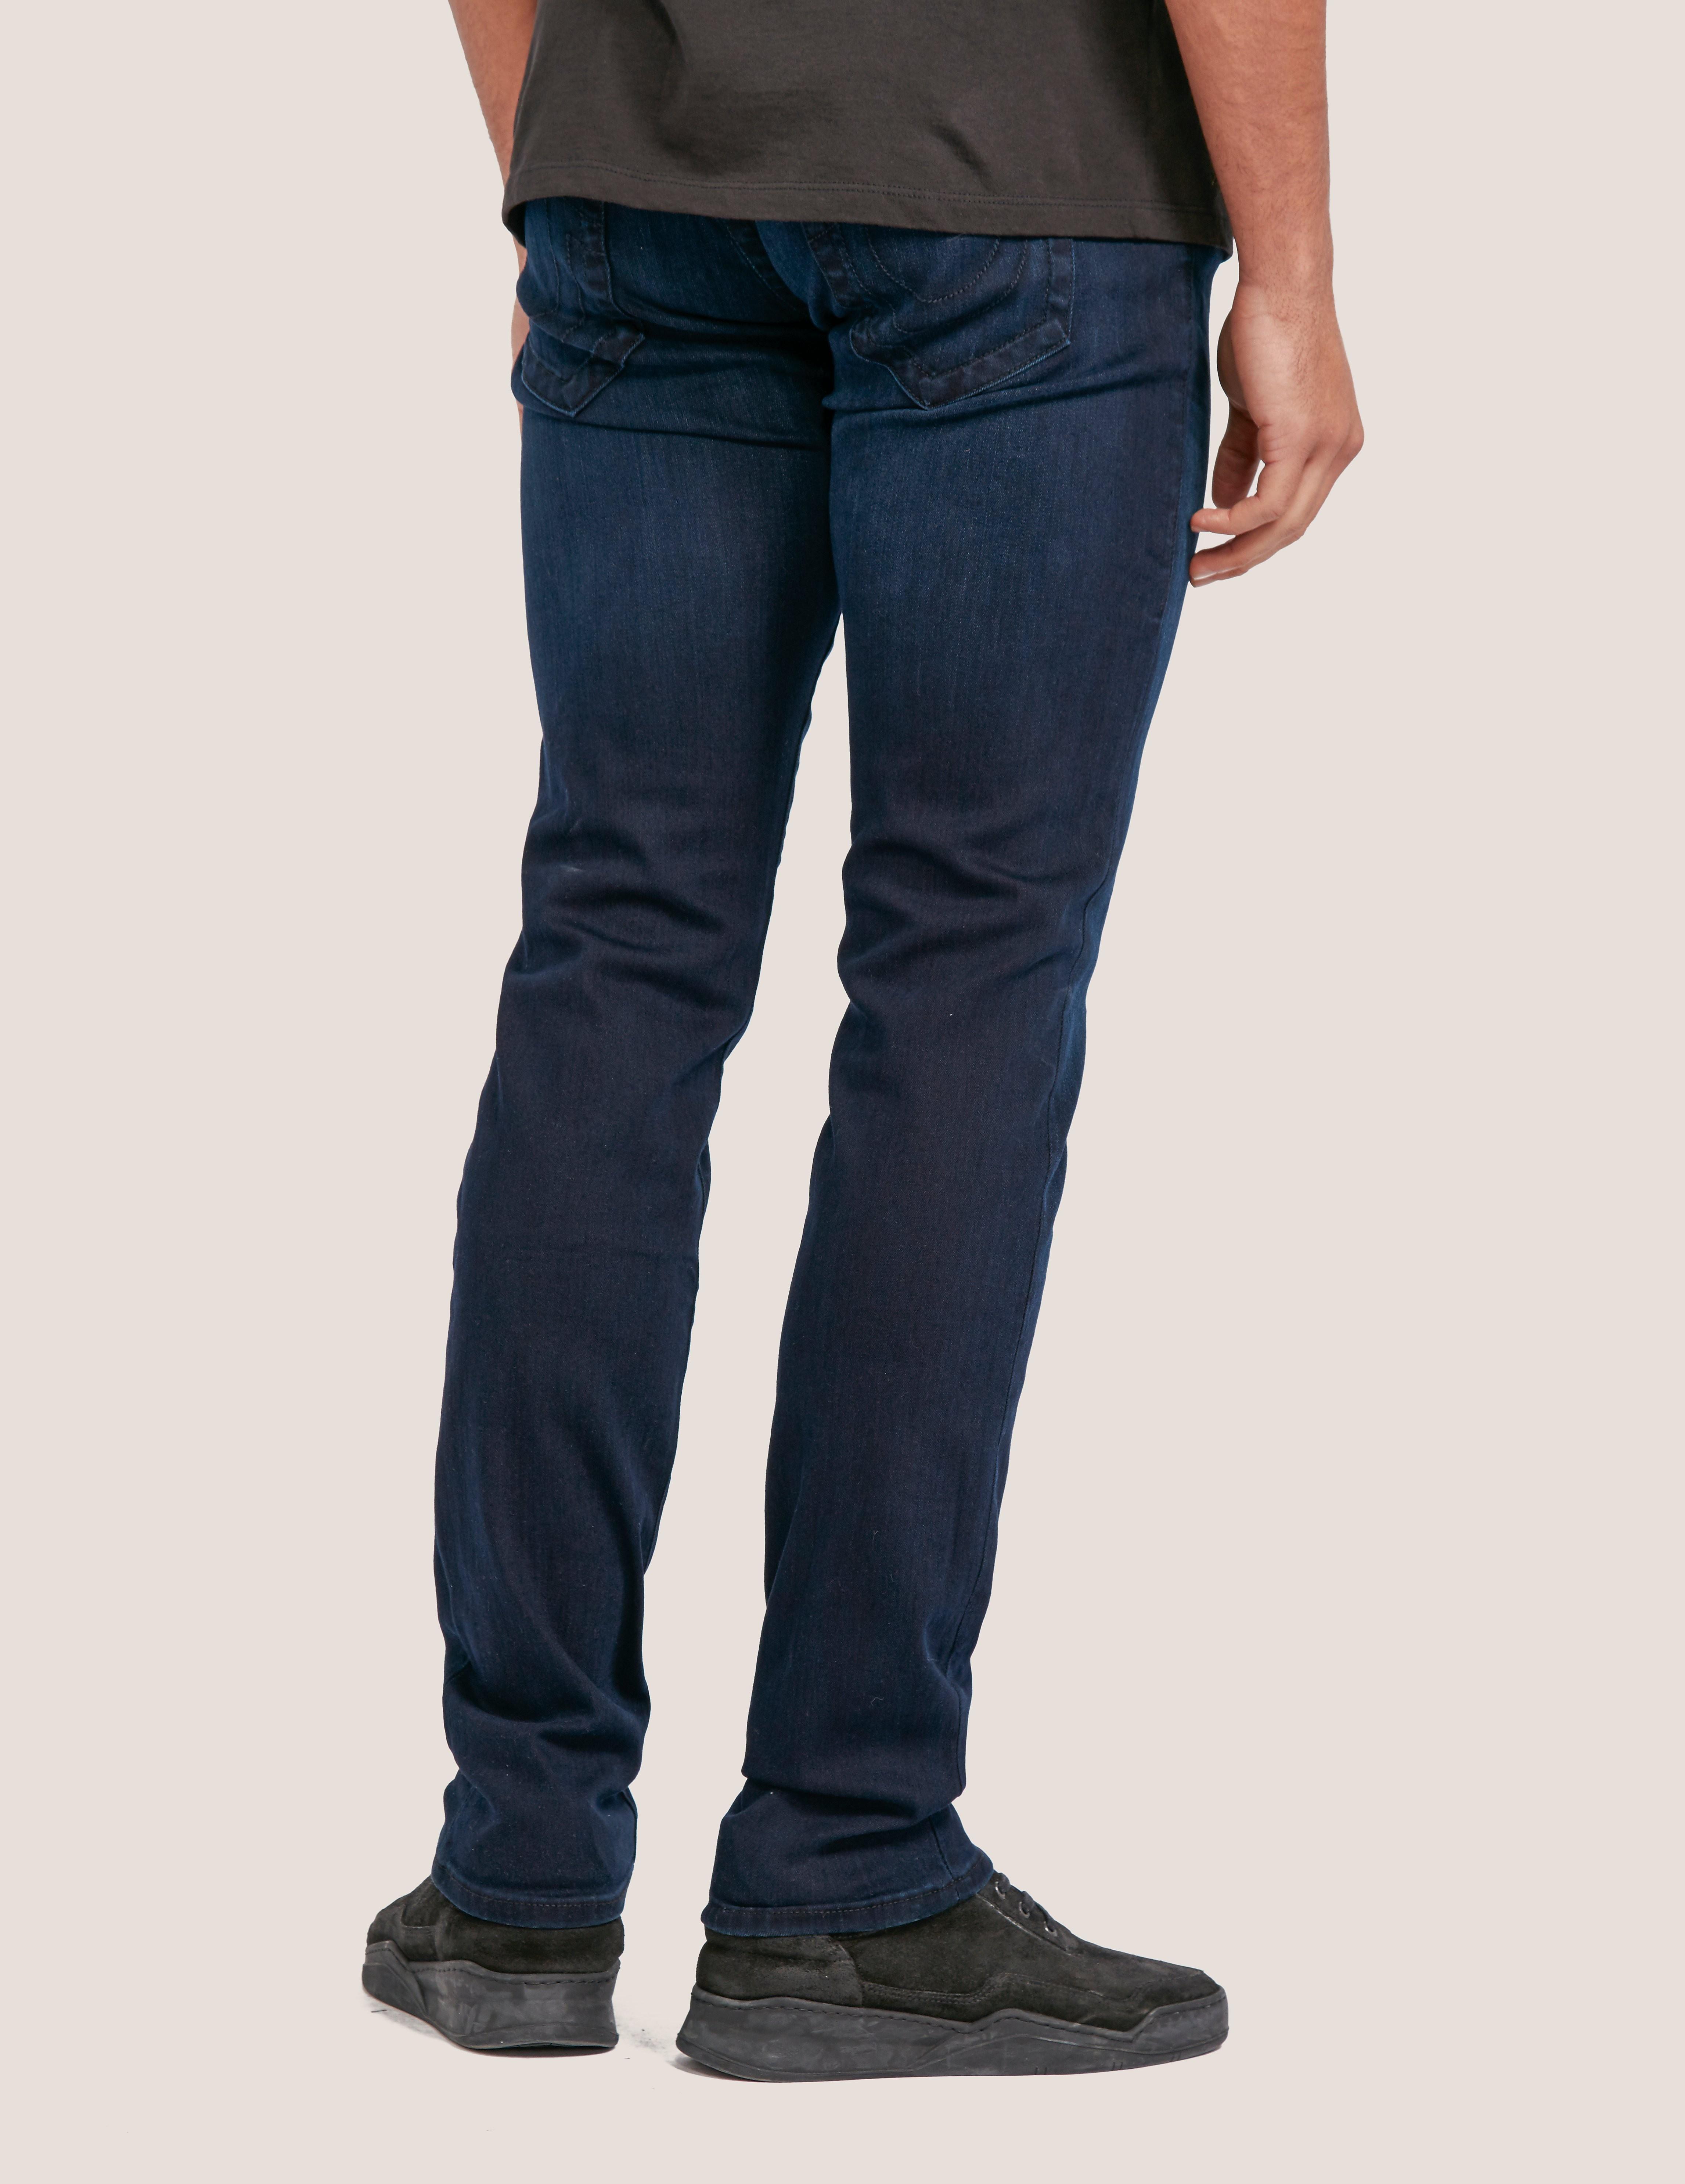 True Religion Rocco Super Stretch Skinny Jeans